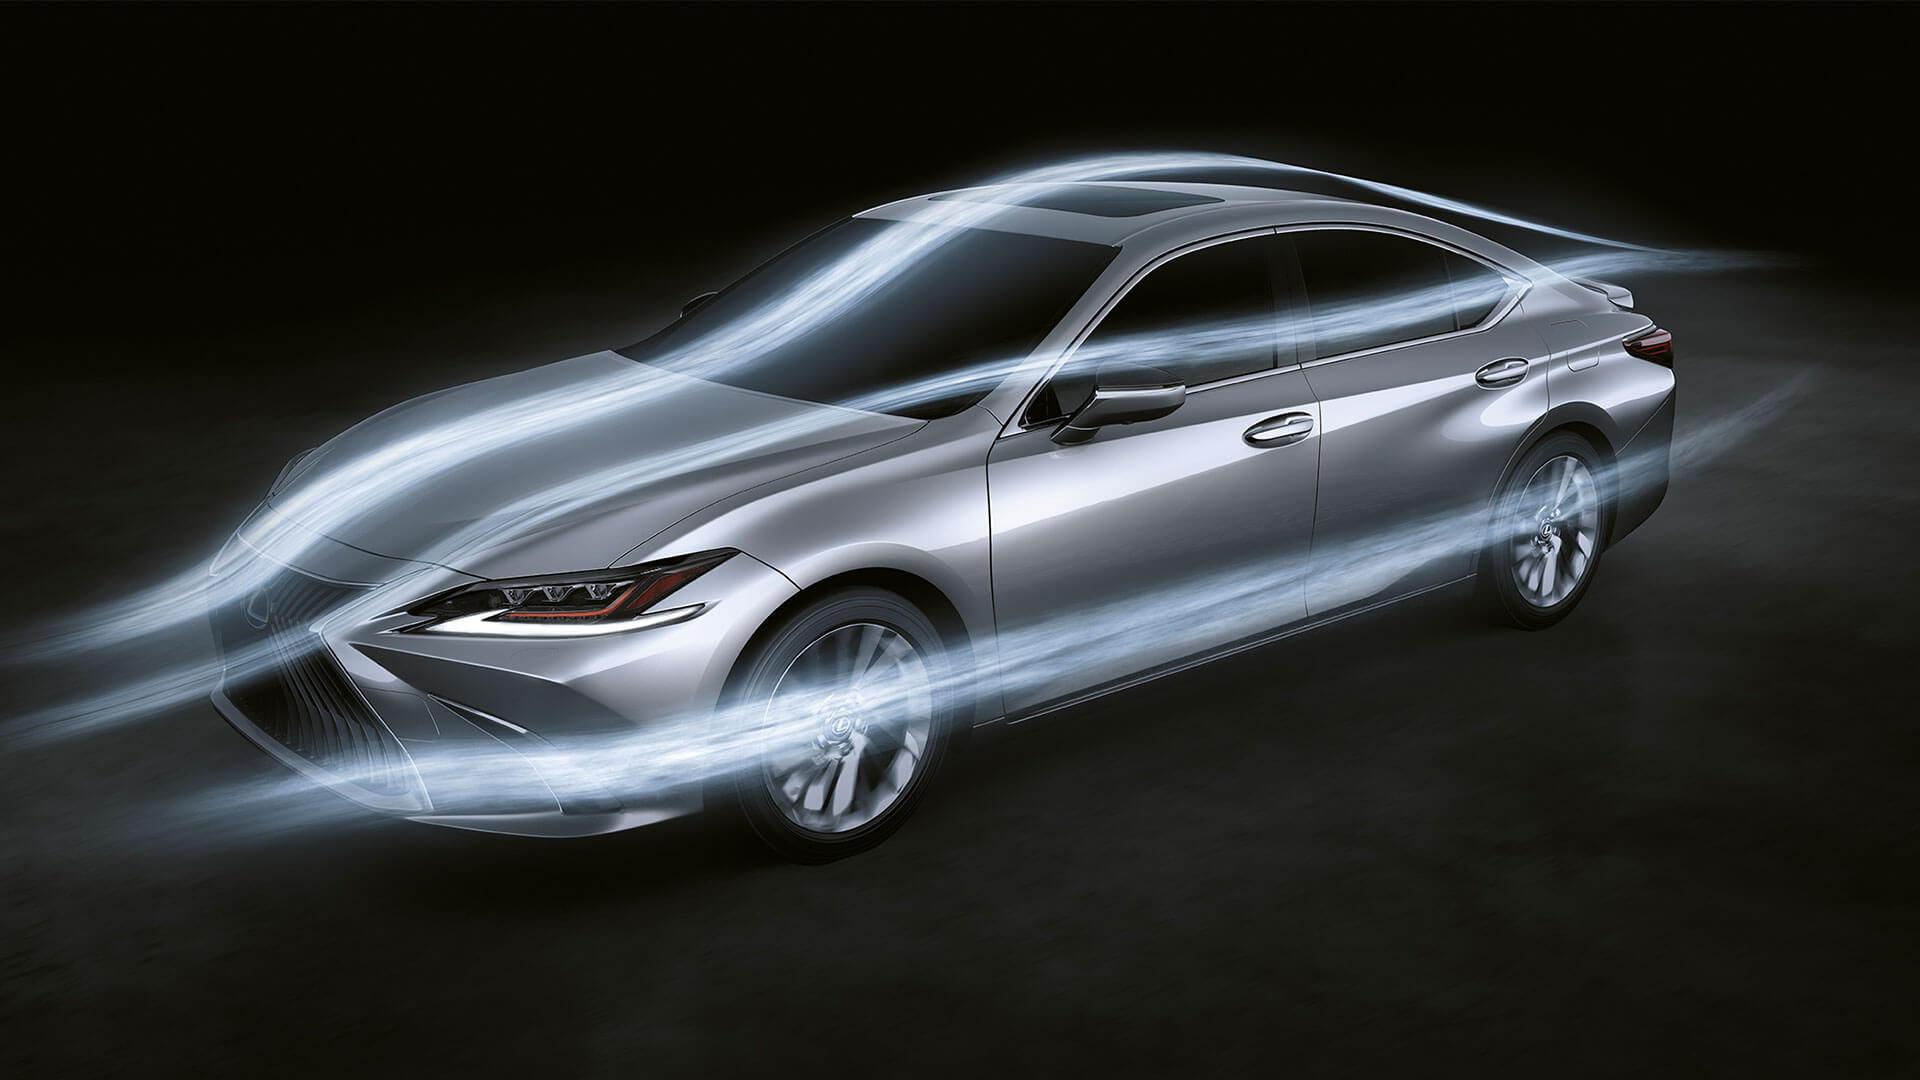 2019 lexus es 250 experience feature aerodynamics